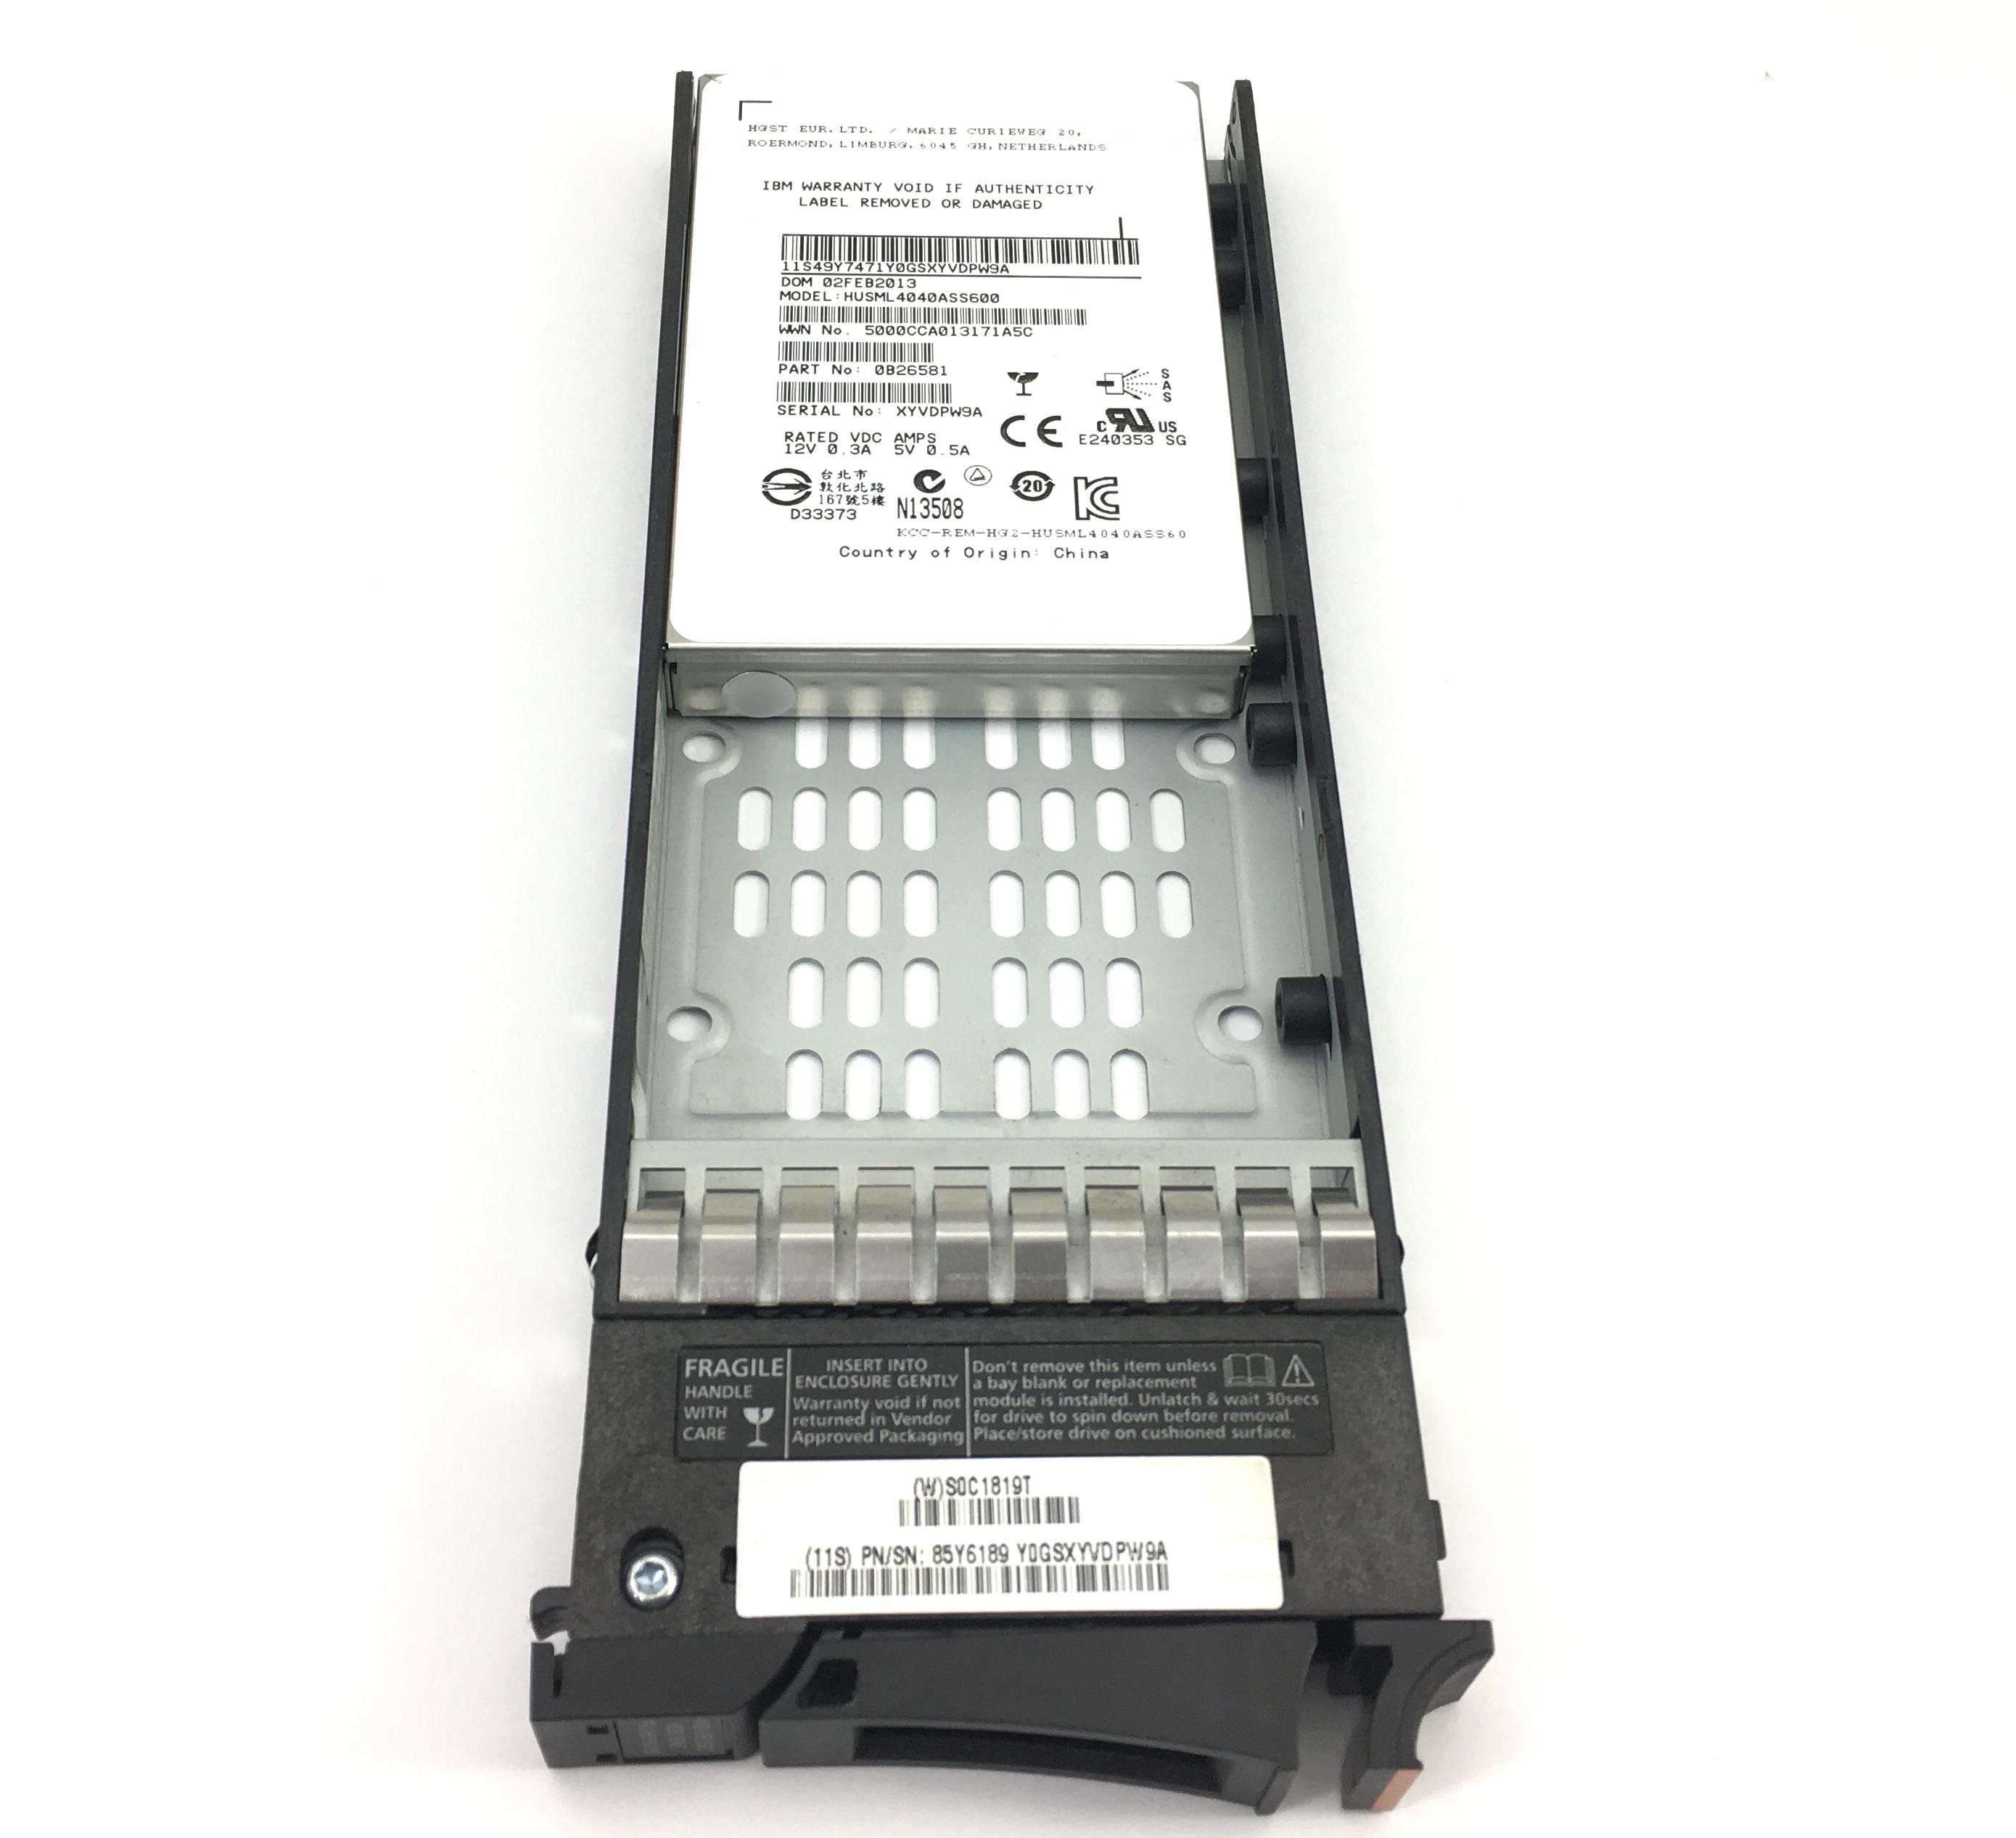 IBM HGST Storwize V7000 400GB 6Gbps SAS 2.5'' Solid State Drive (85Y6189)